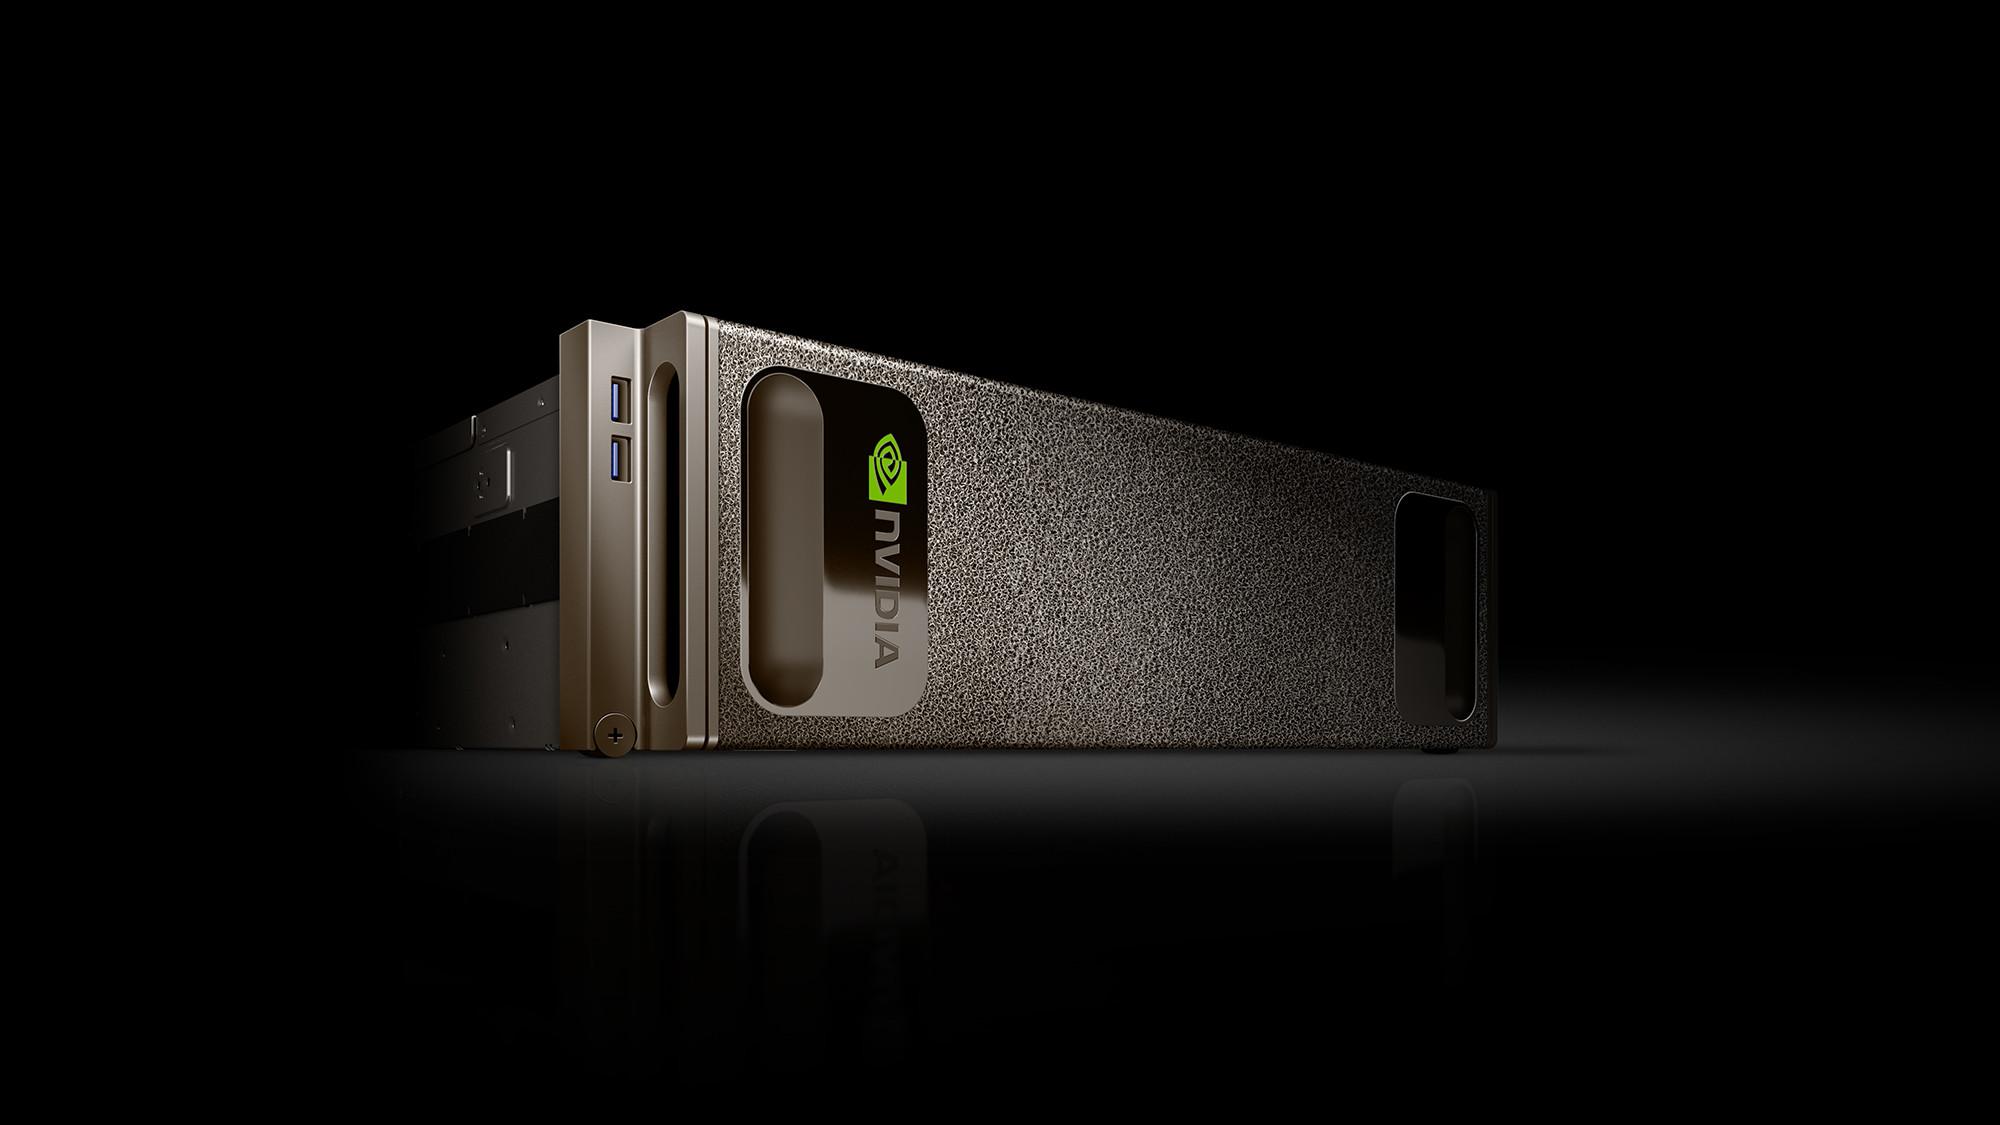 Nvidia DGX-1 2